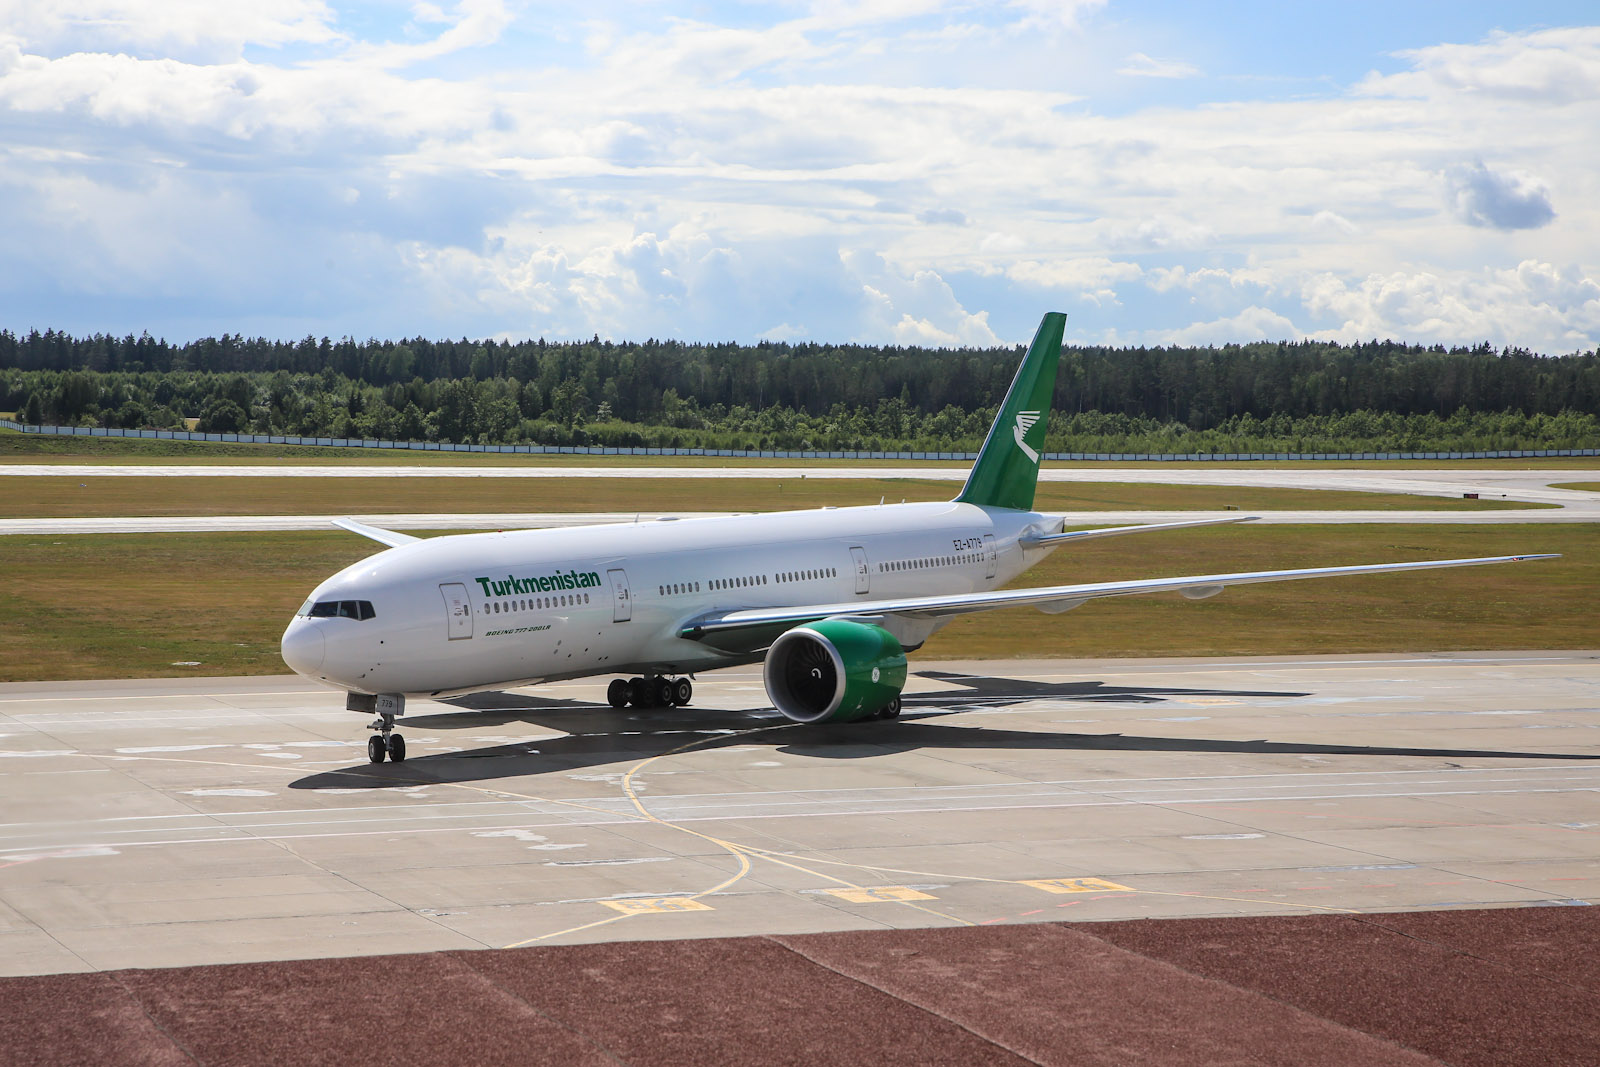 Боинг-777-200 Туркменских авиалиний в аэропорту Минск